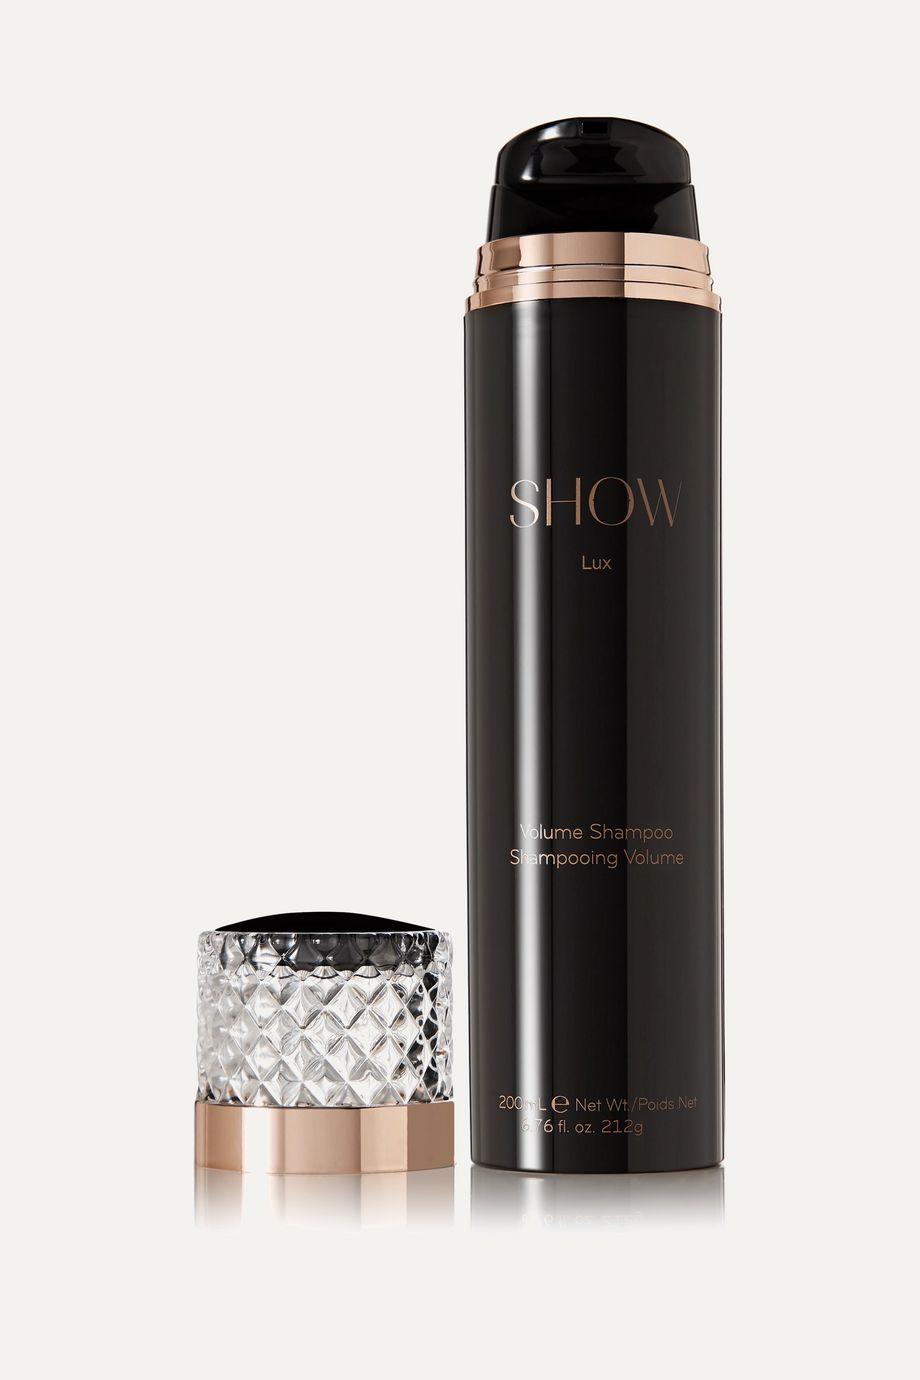 SHOW Beauty Lux Volume Shampoo, 200ml